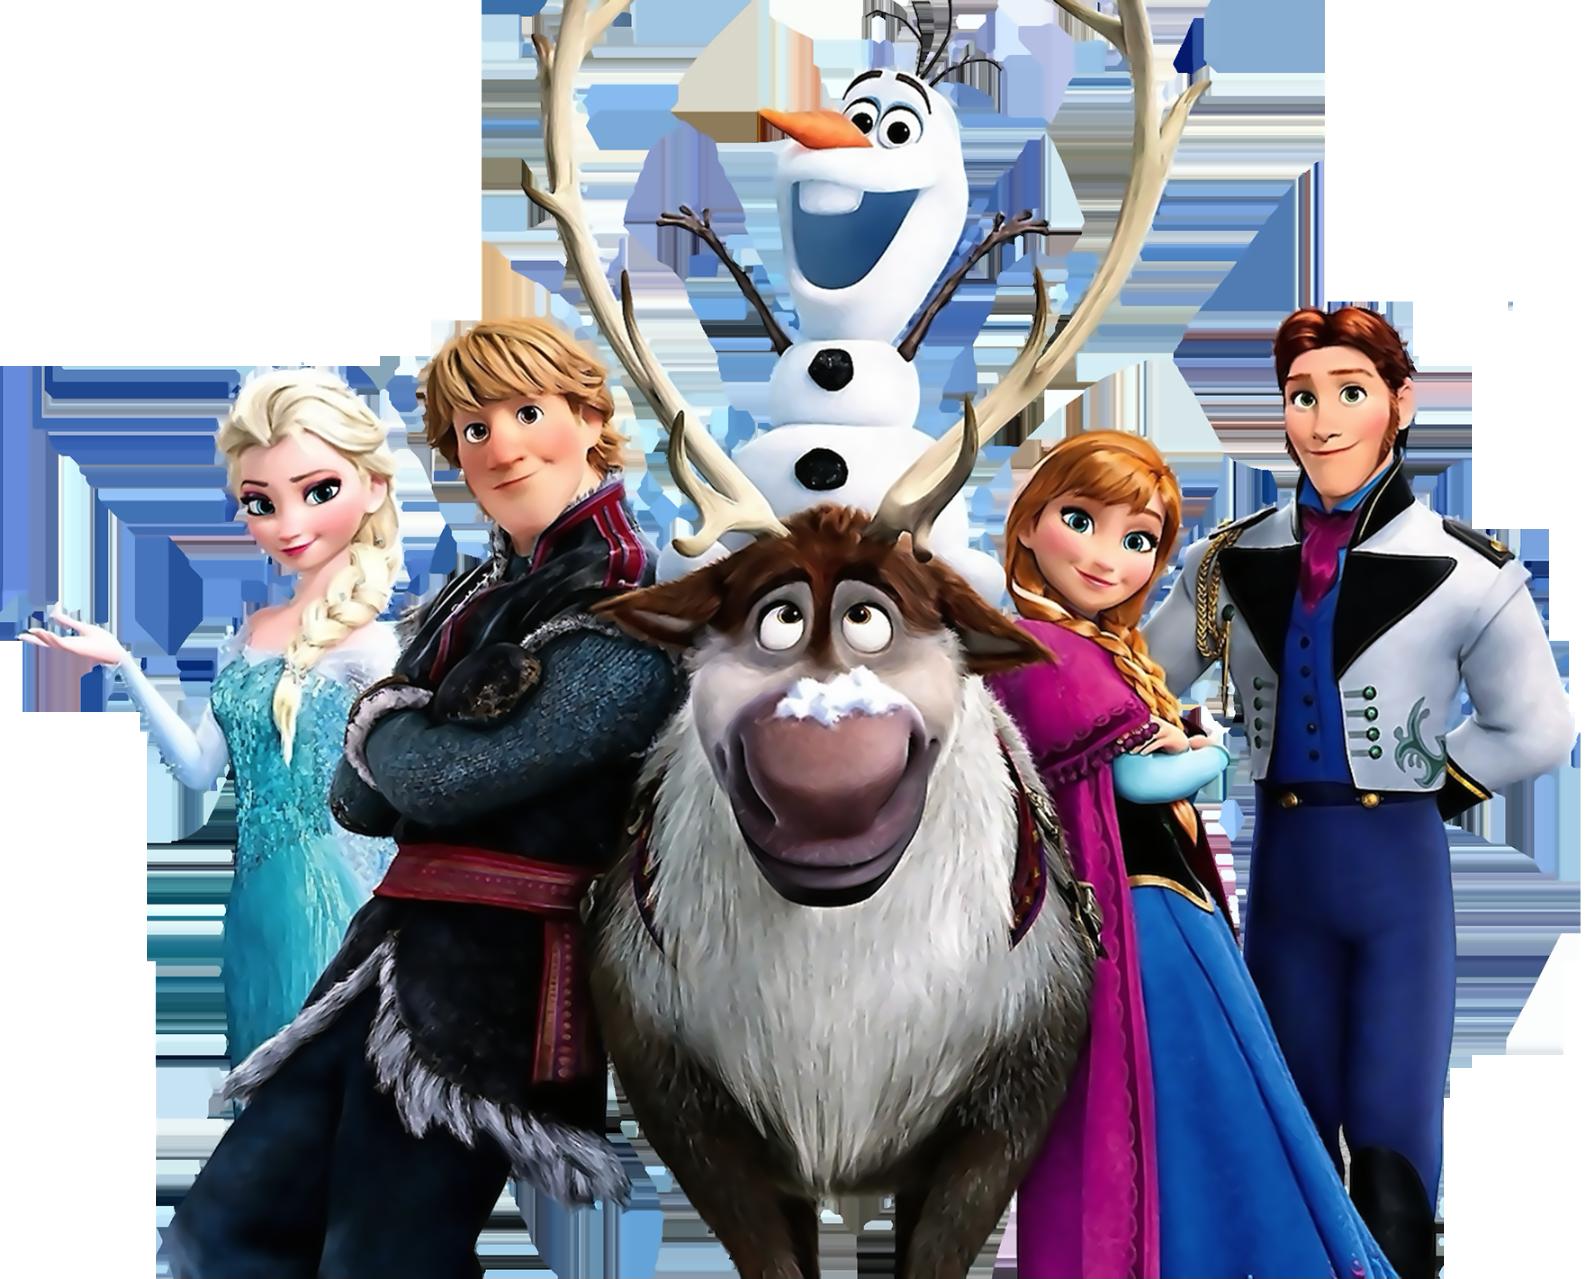 Frozen Clipart 3rd  Frozen 3rd Transparent Free For